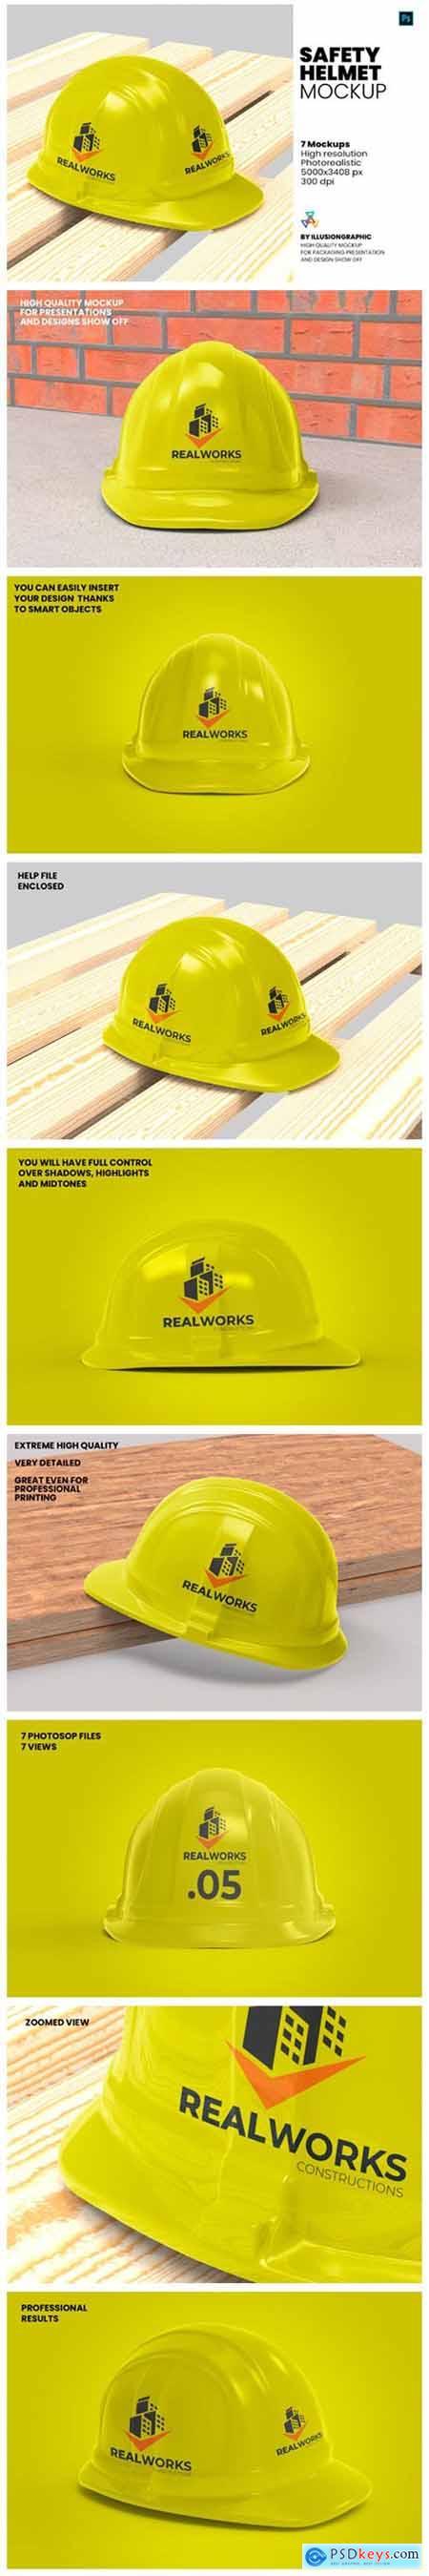 Safety Helmet Mockup - 7 Views 8547248